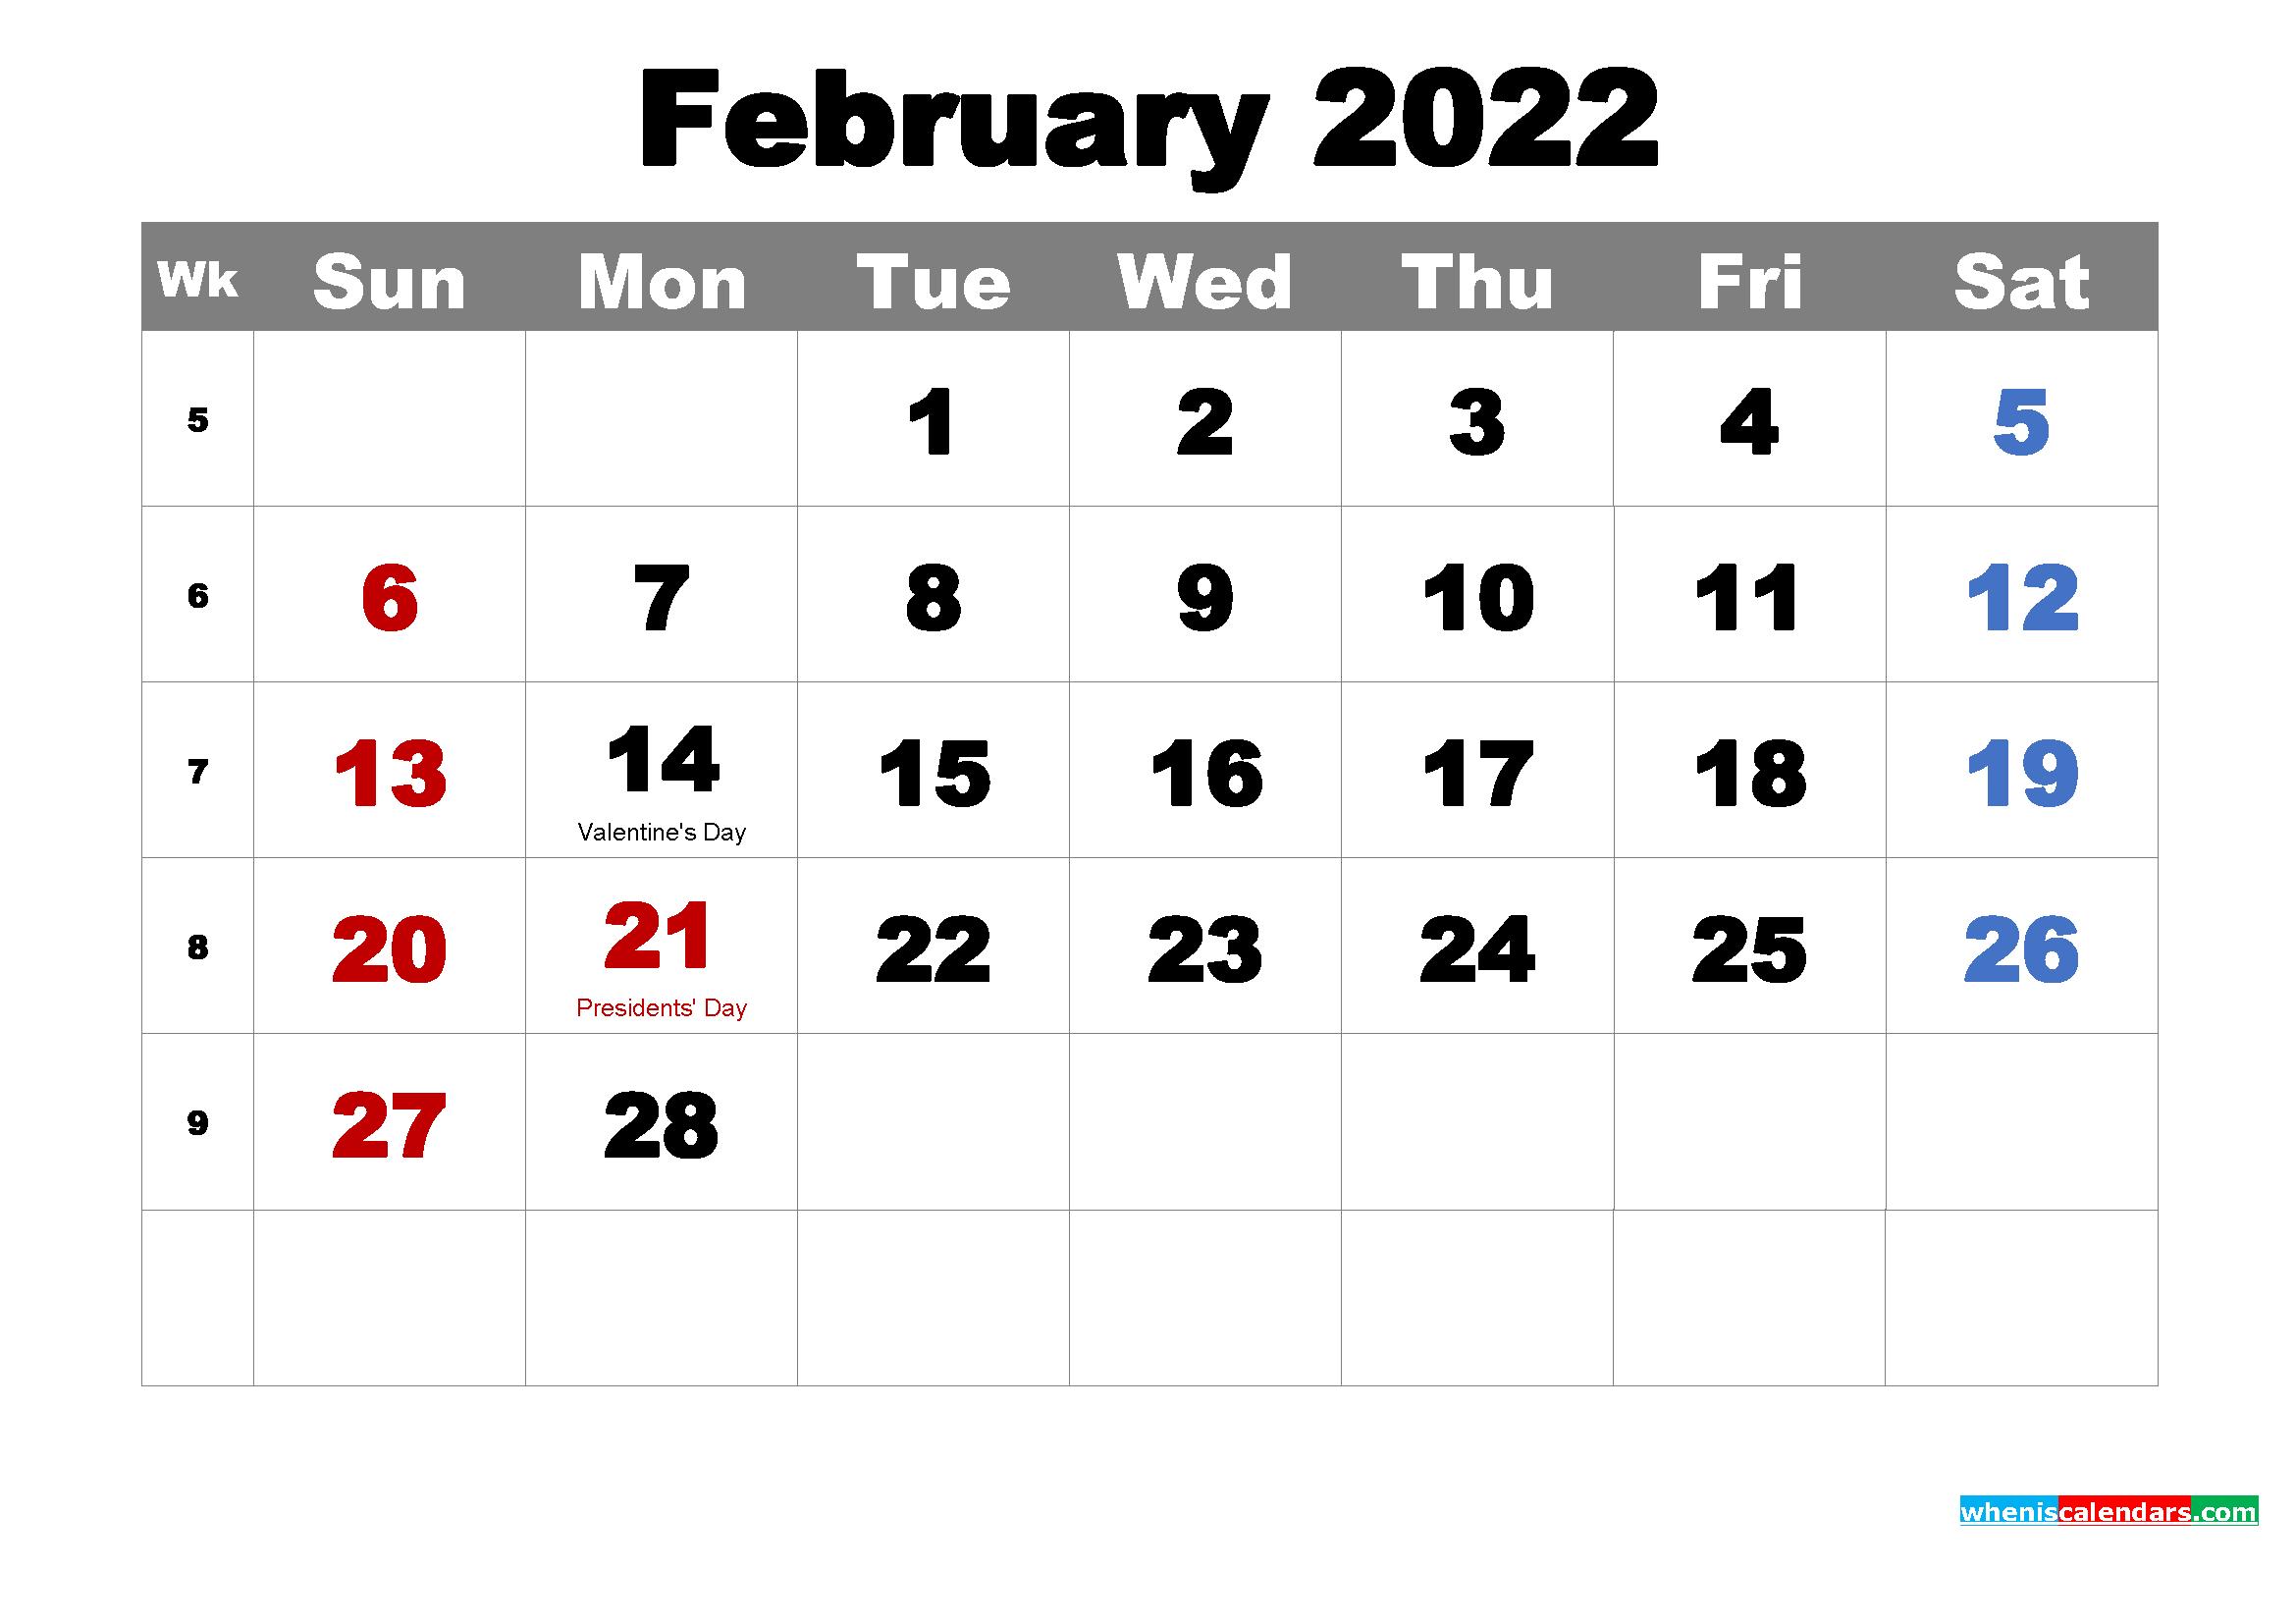 Free Printable February 2022 Calendar With Holidays As Pertaining To Printable Februaryy 2022 Calendar